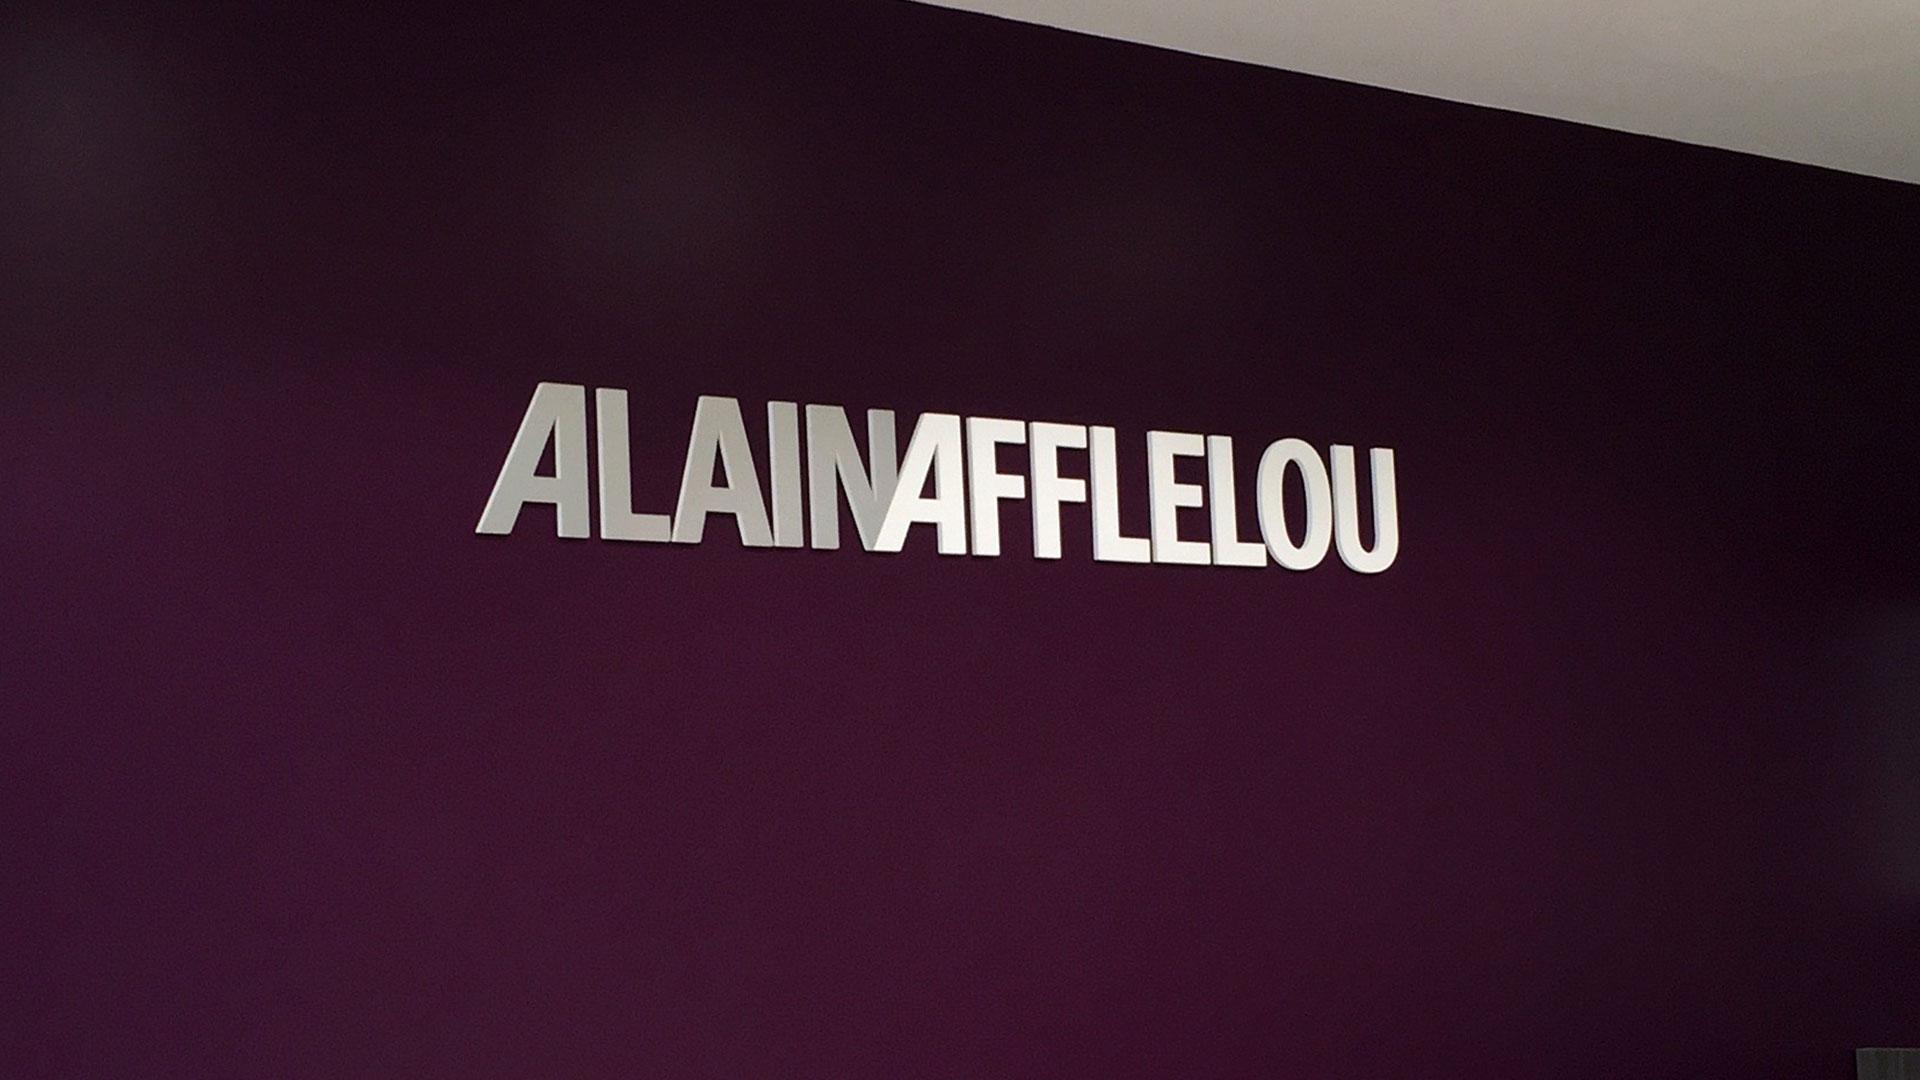 alain-afflelou-signaletique-01